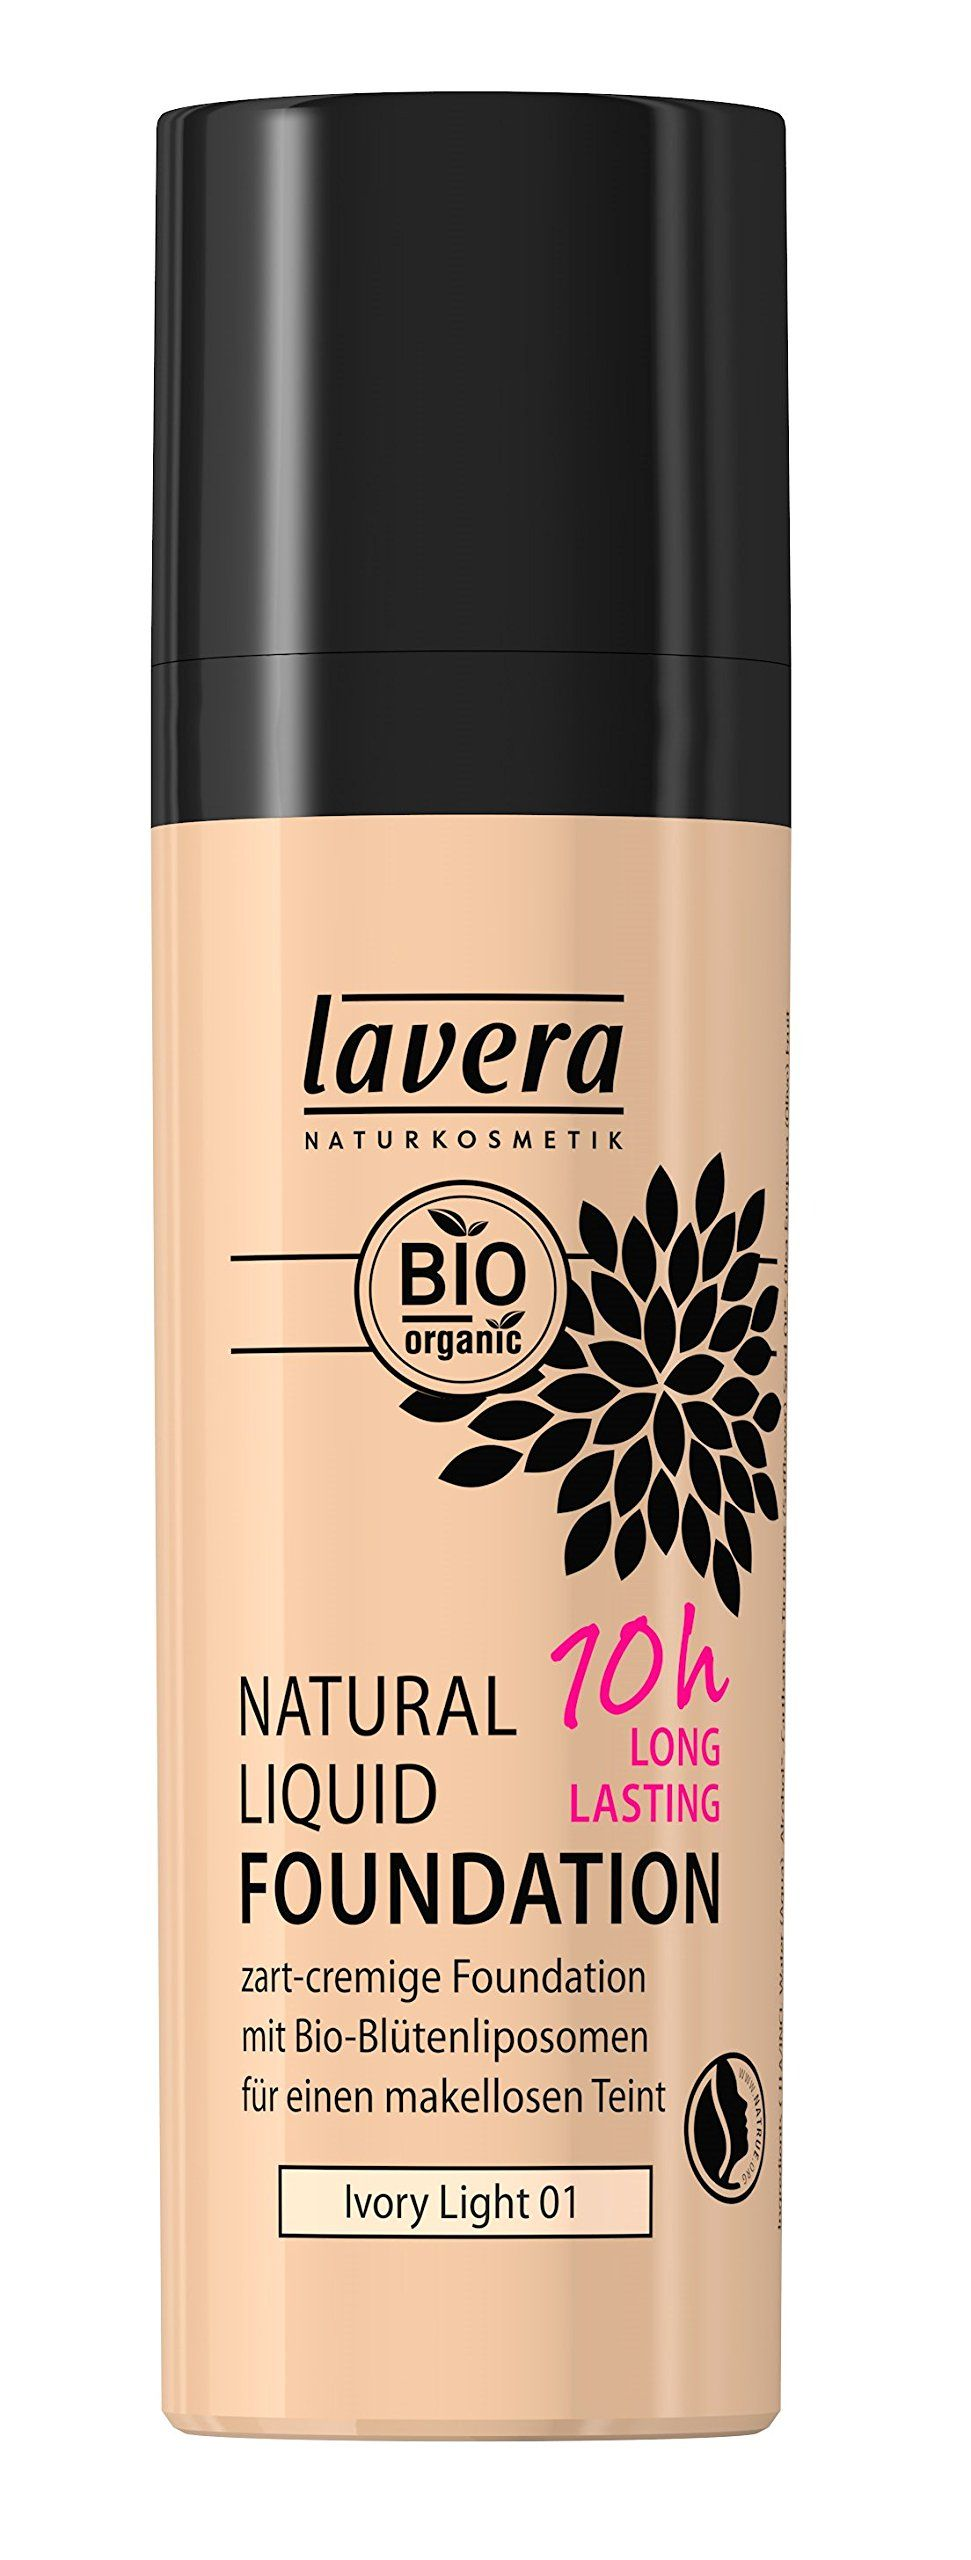 Lavera Natural Liquid Foundation Makeup 10Hour Long